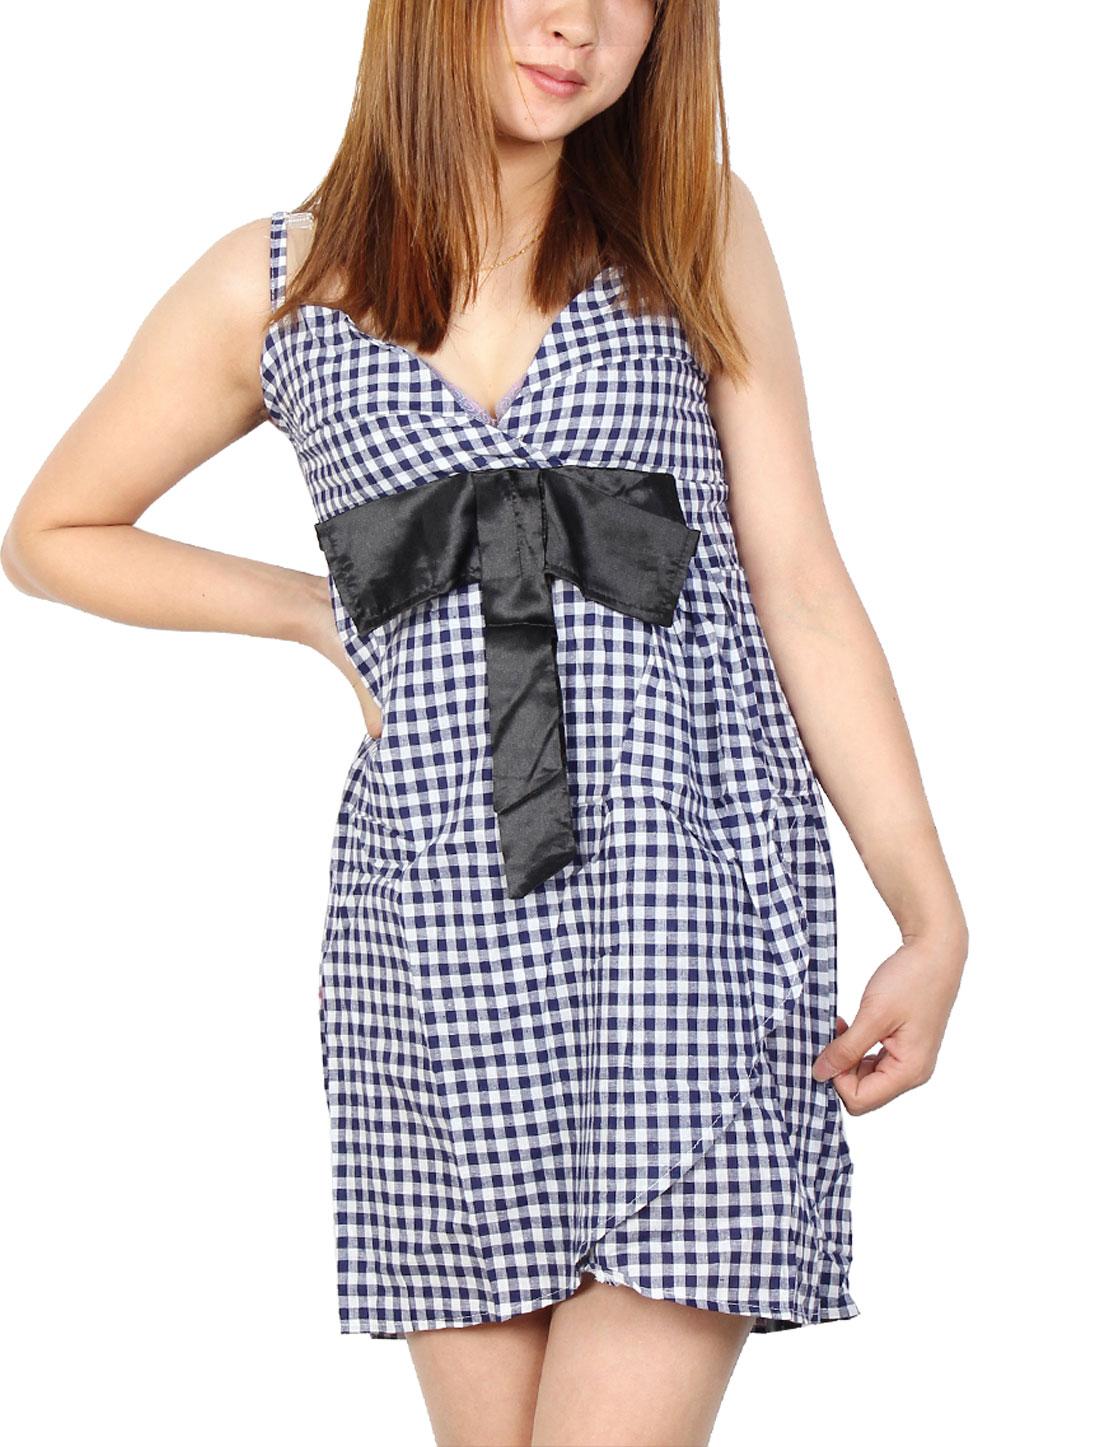 Plaid Printed Spaghetti Straps Sweetheart Neckline Skirt for Ladies XS